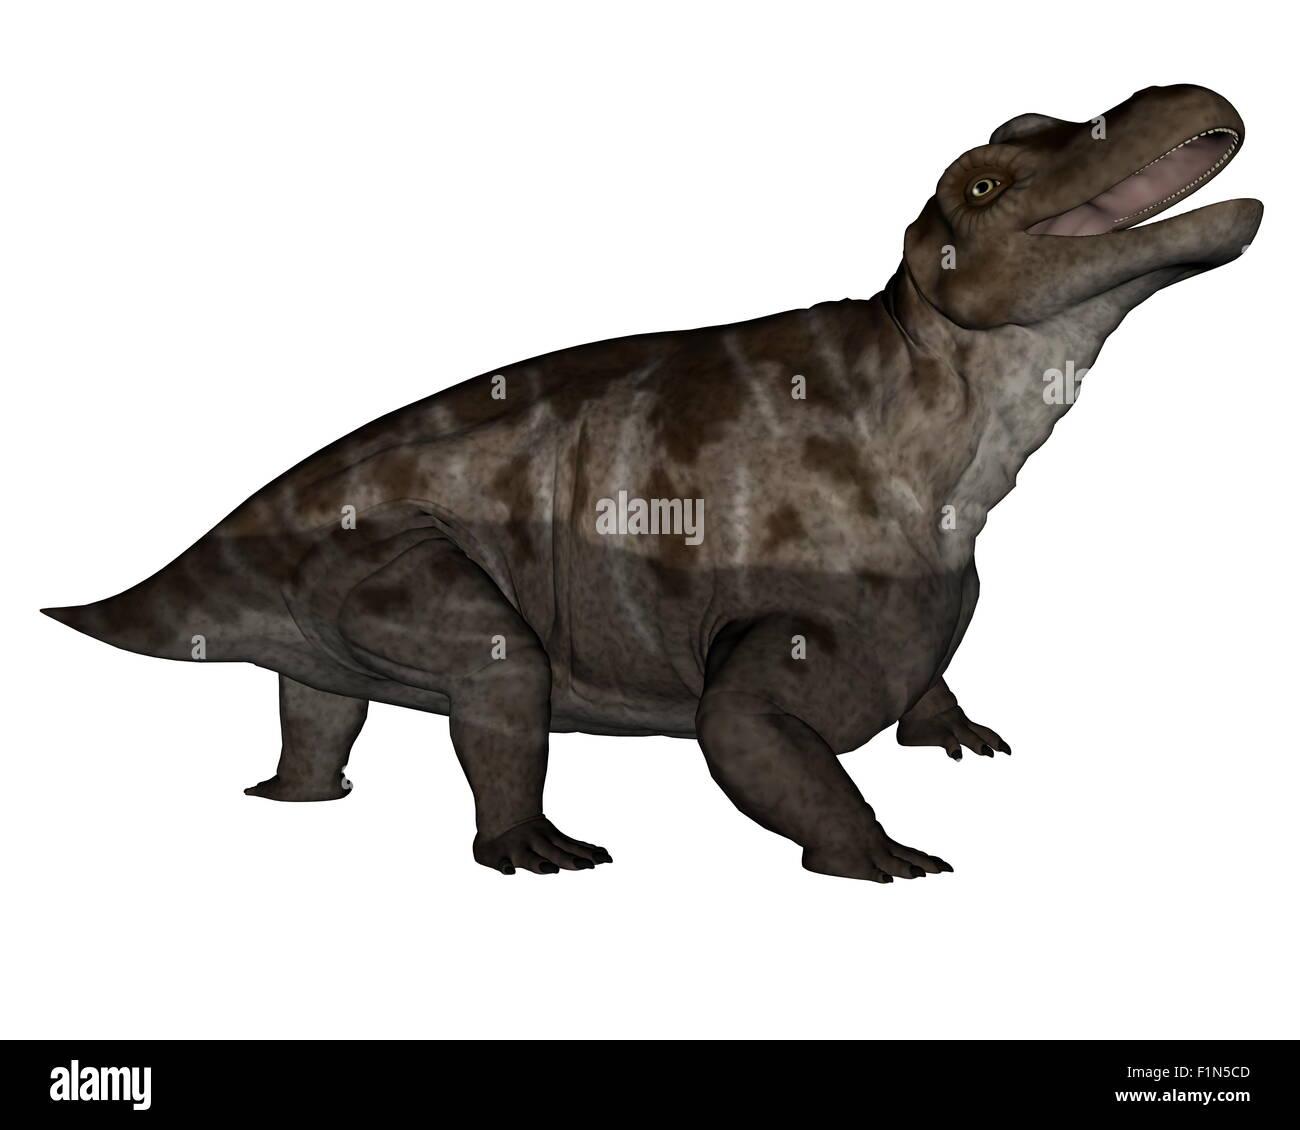 Keratocephalus dinosaur roaring isolated in white background - 3D render - Stock Image